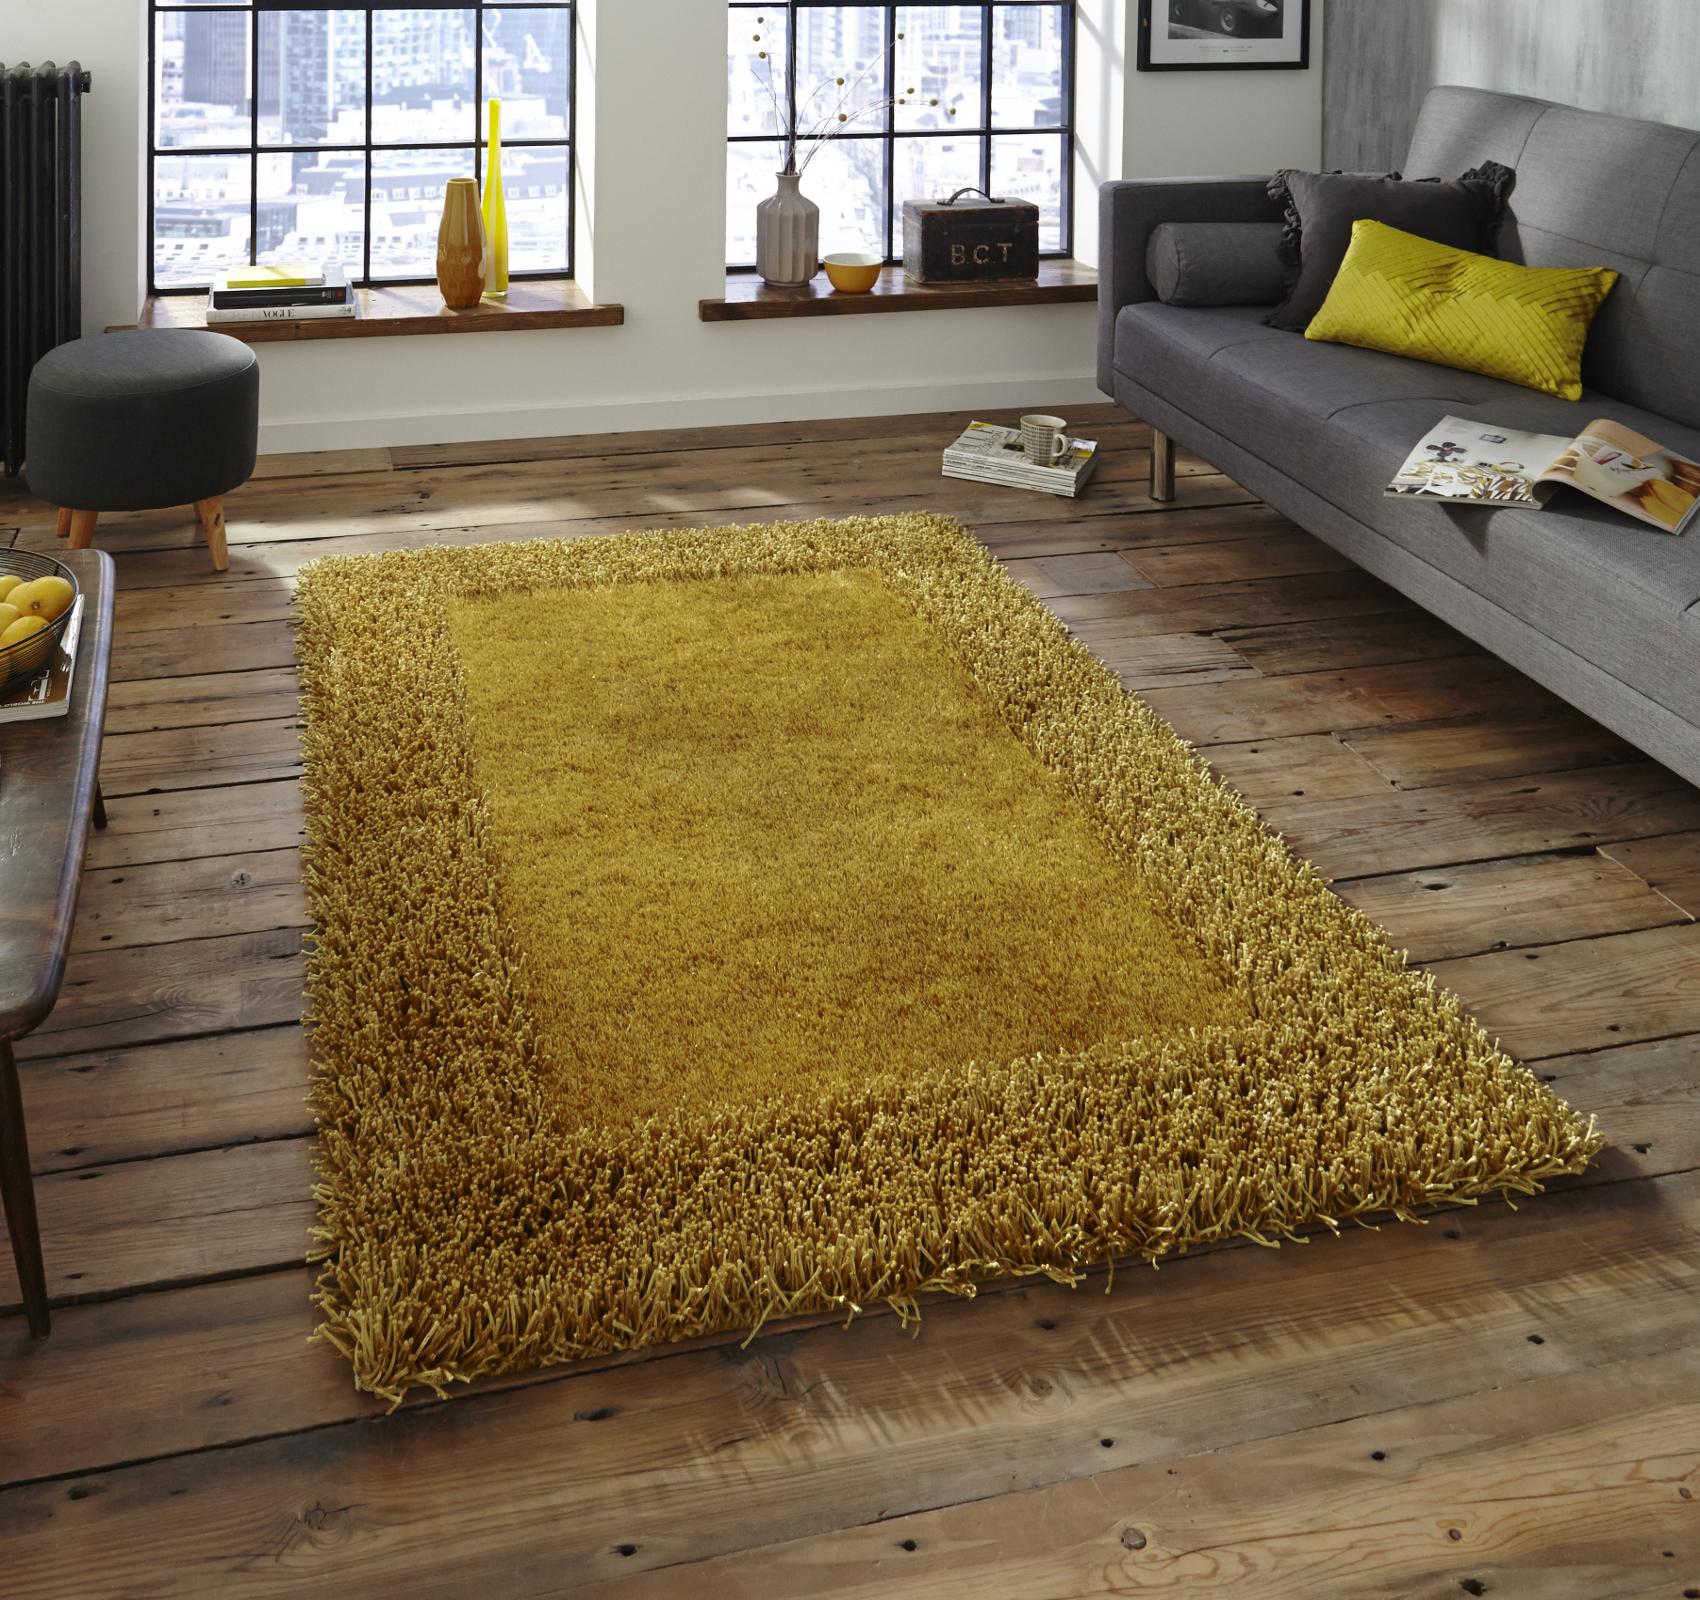 Soft sable shaggy pile rug hand tufted rectangle design for Floor mat design